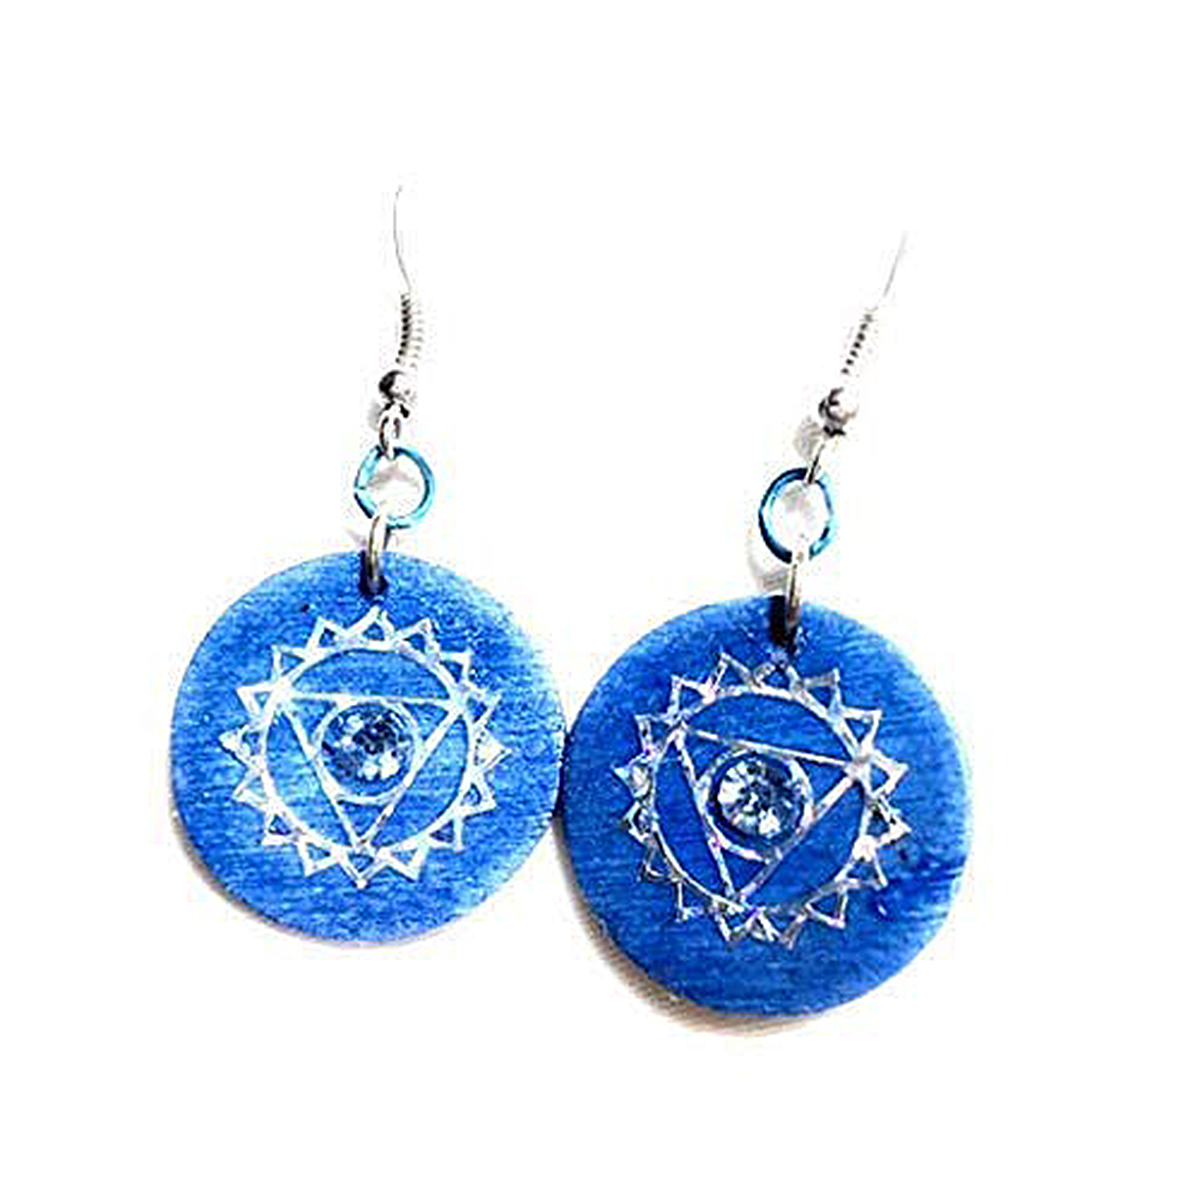 throat-chakra-earrings